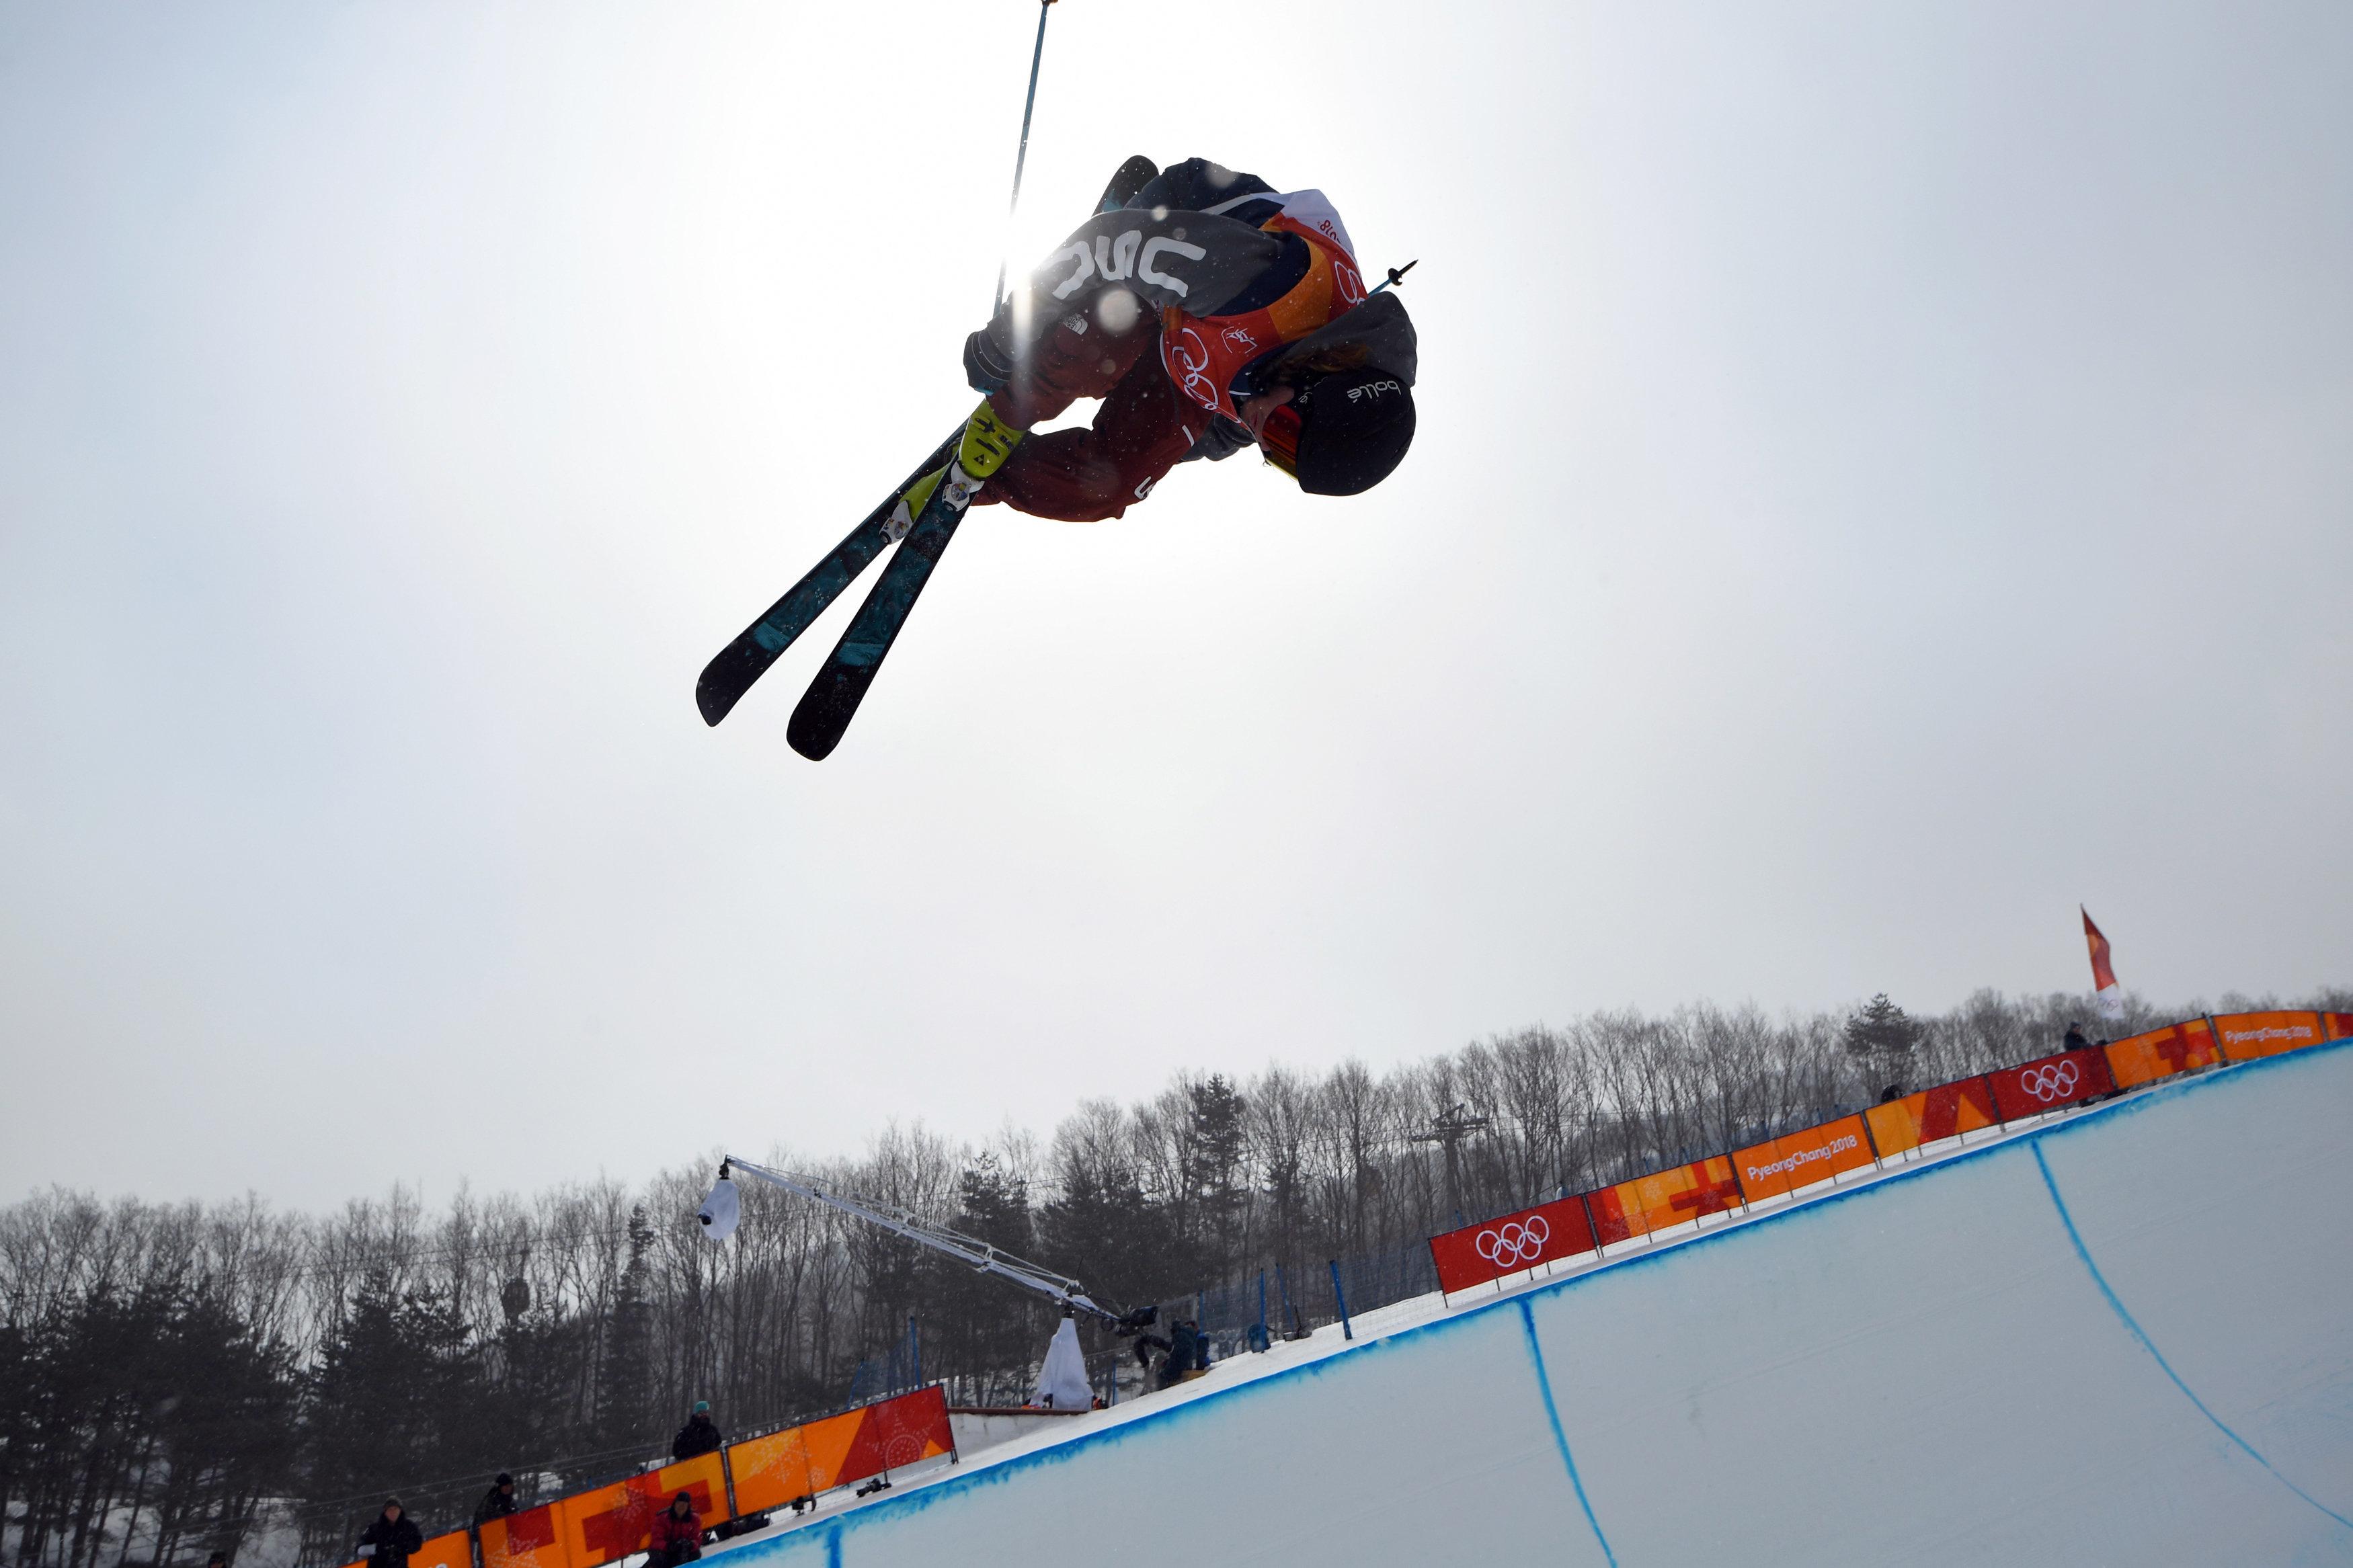 Freestyle Skiing - Pyeongchang 2018 Winter Olympics - Men's Ski Halfpipe Training - Phoenix Snow Park - Pyeongchang, South Korea - February 22, 2018 - David Wise of the U.S. trains. REUTERS/Dylan Martinez